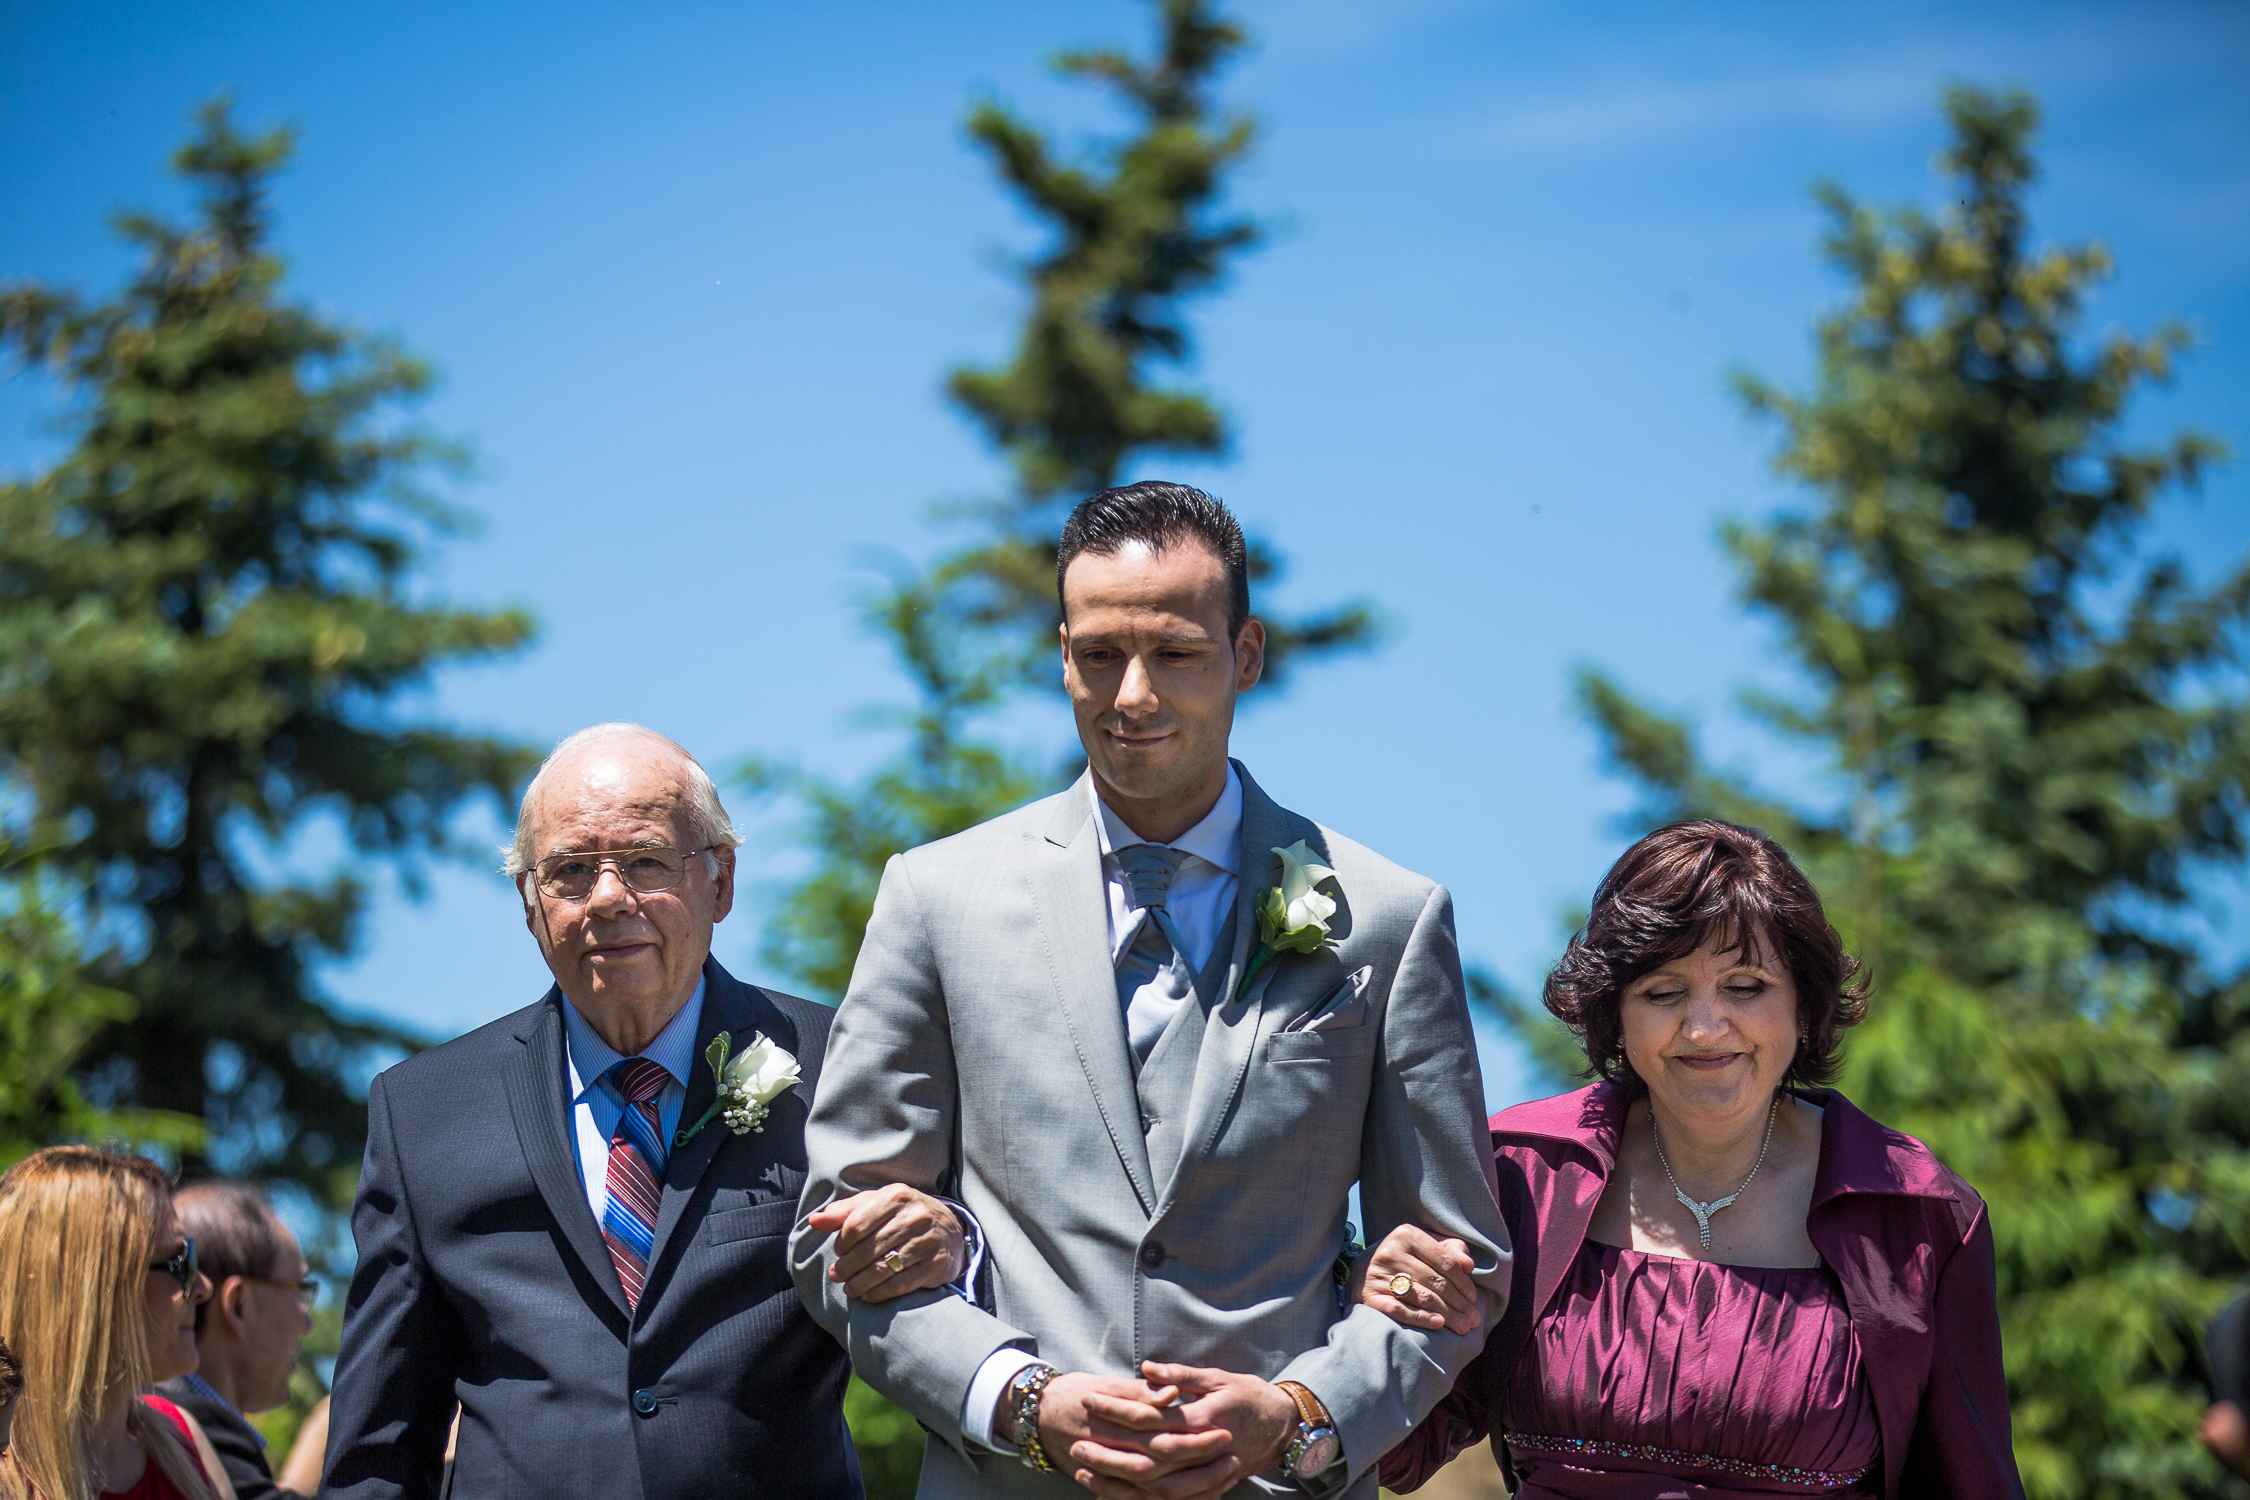 Paradise-Banquet-Hall-Wedding-Vaughan-Ontario-0027.jpg